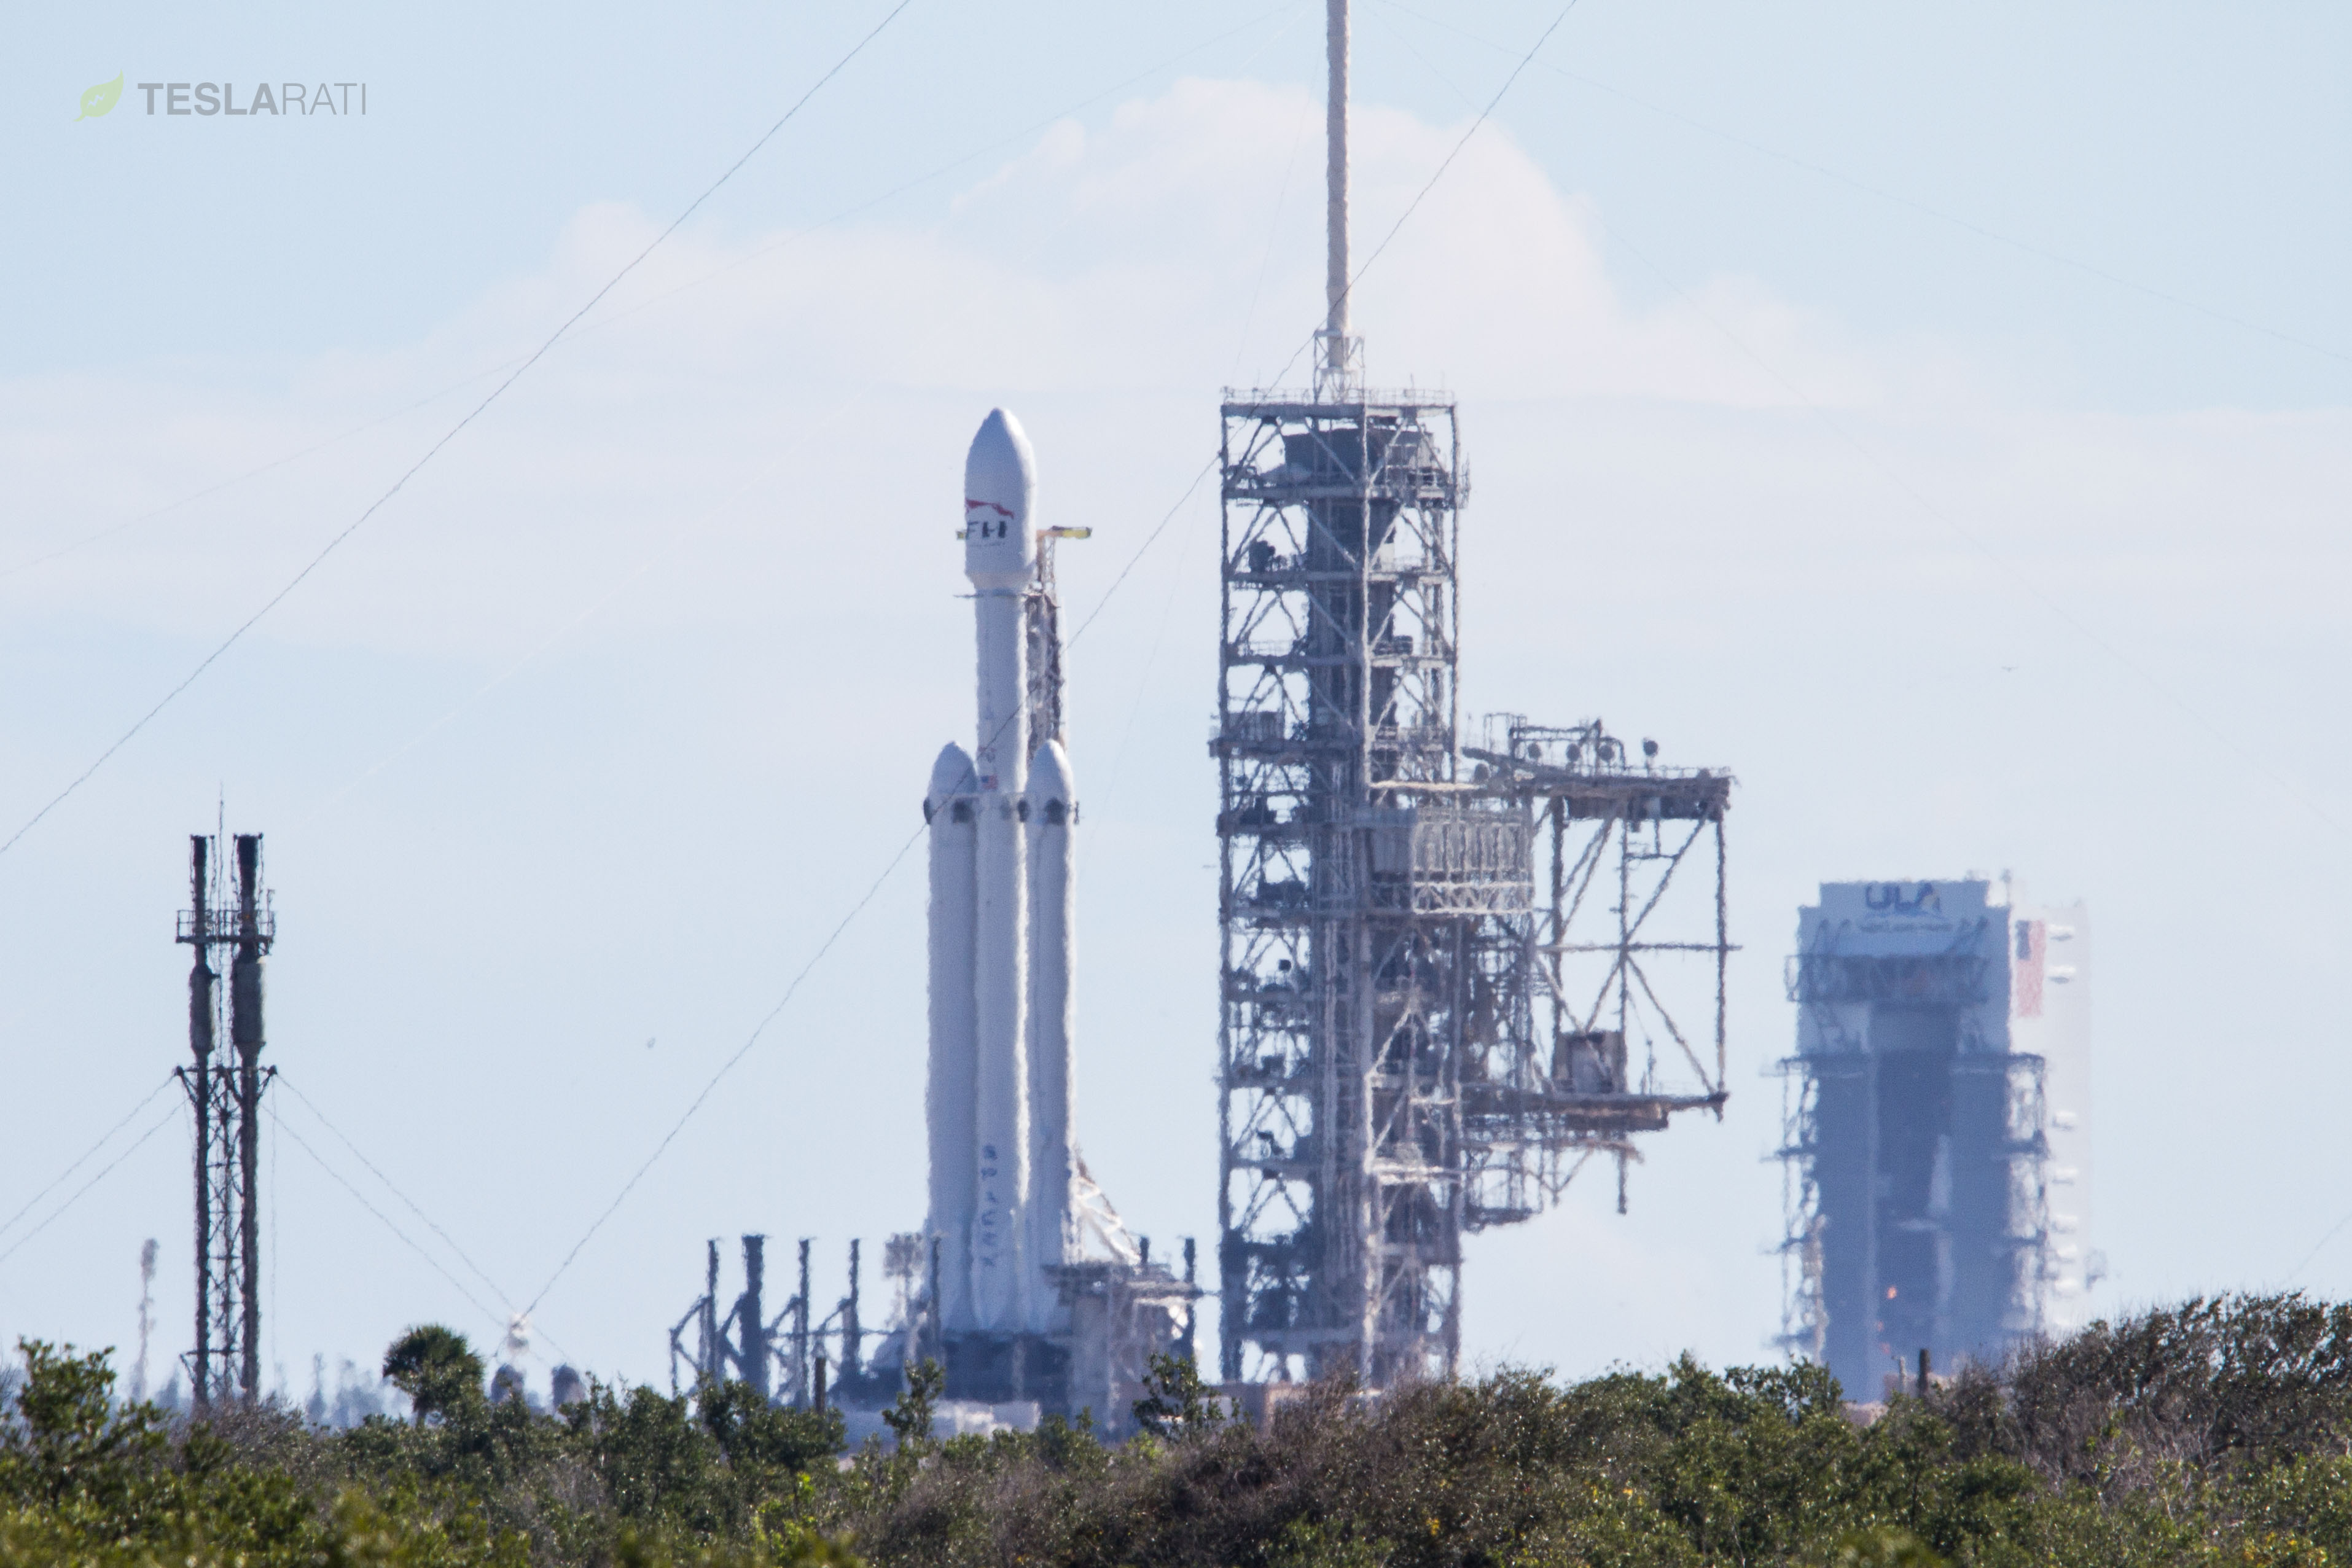 Falcon Heavy ULAbackground-4666